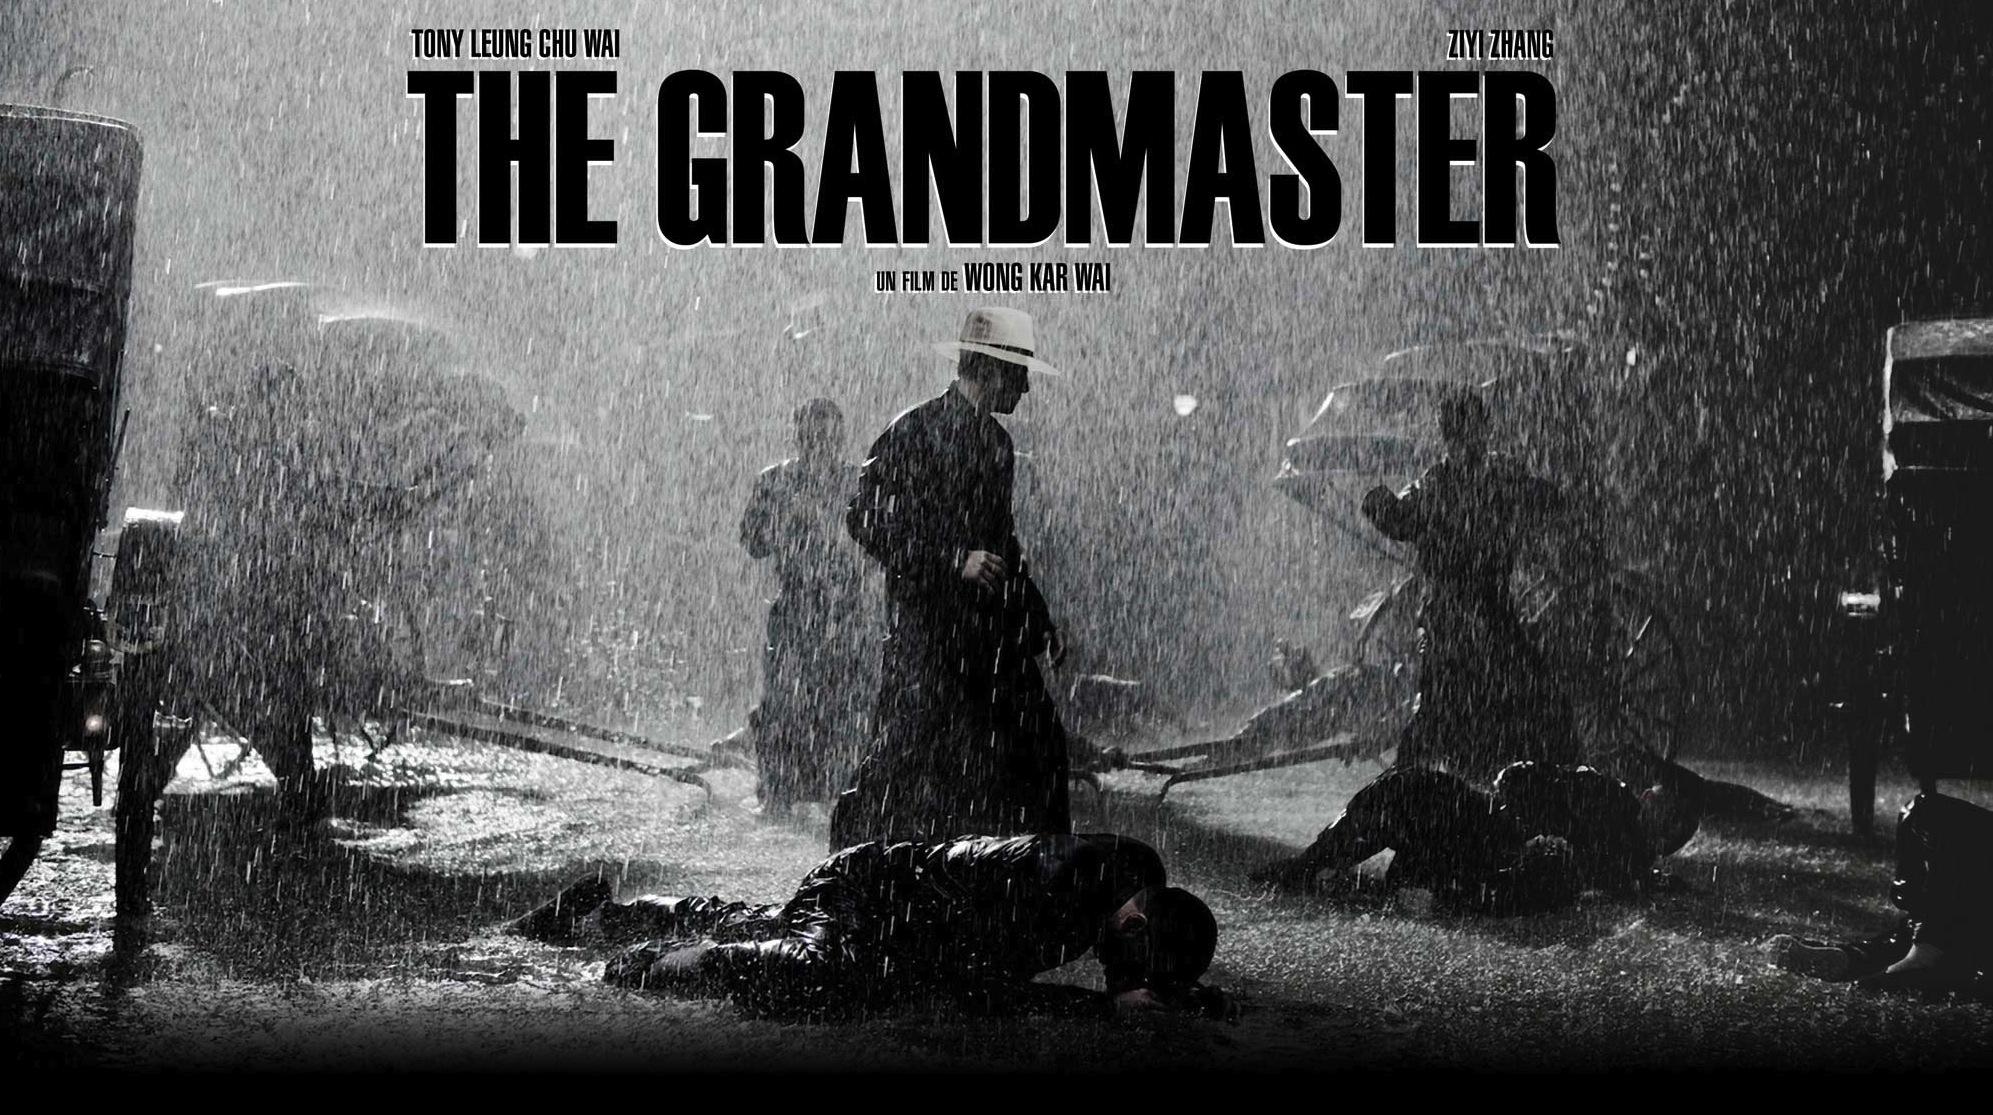 The grandmaster electric shadows poster the grandmaster voltagebd Gallery